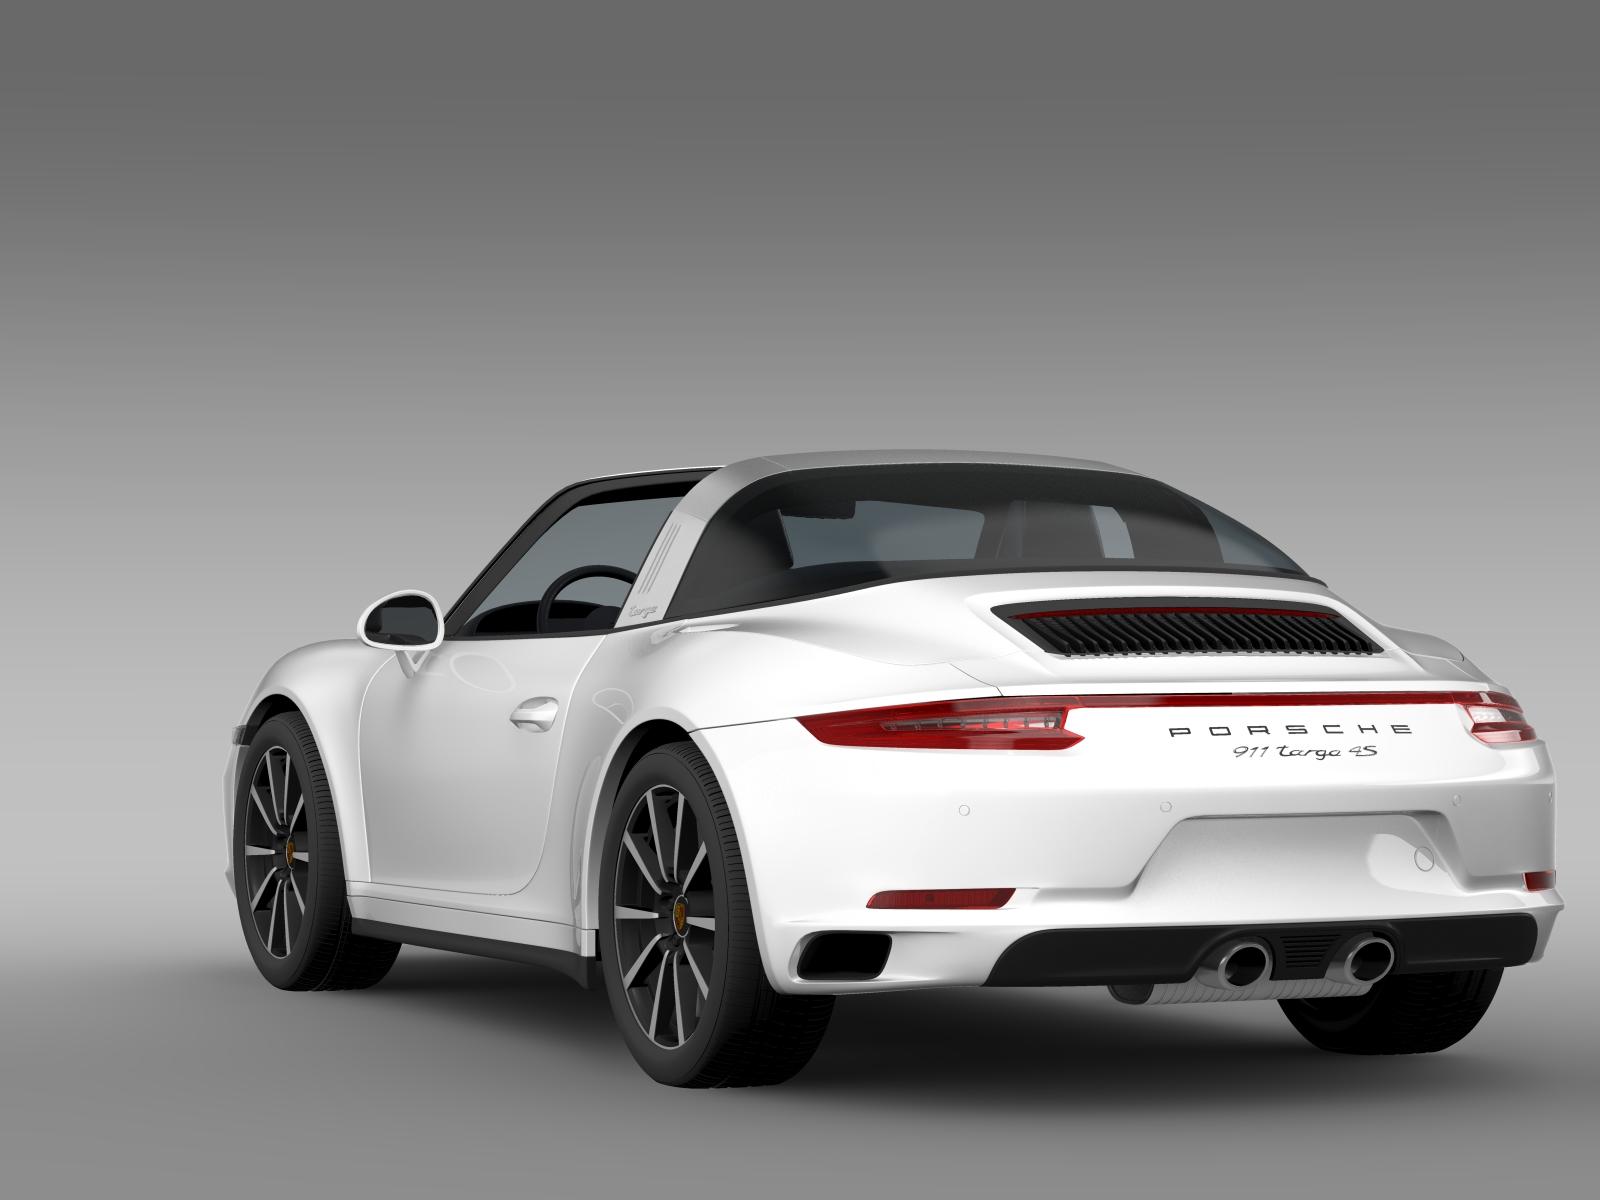 Porsche 911 Targa 4s 991 2016 3d Model Buy Porsche 911